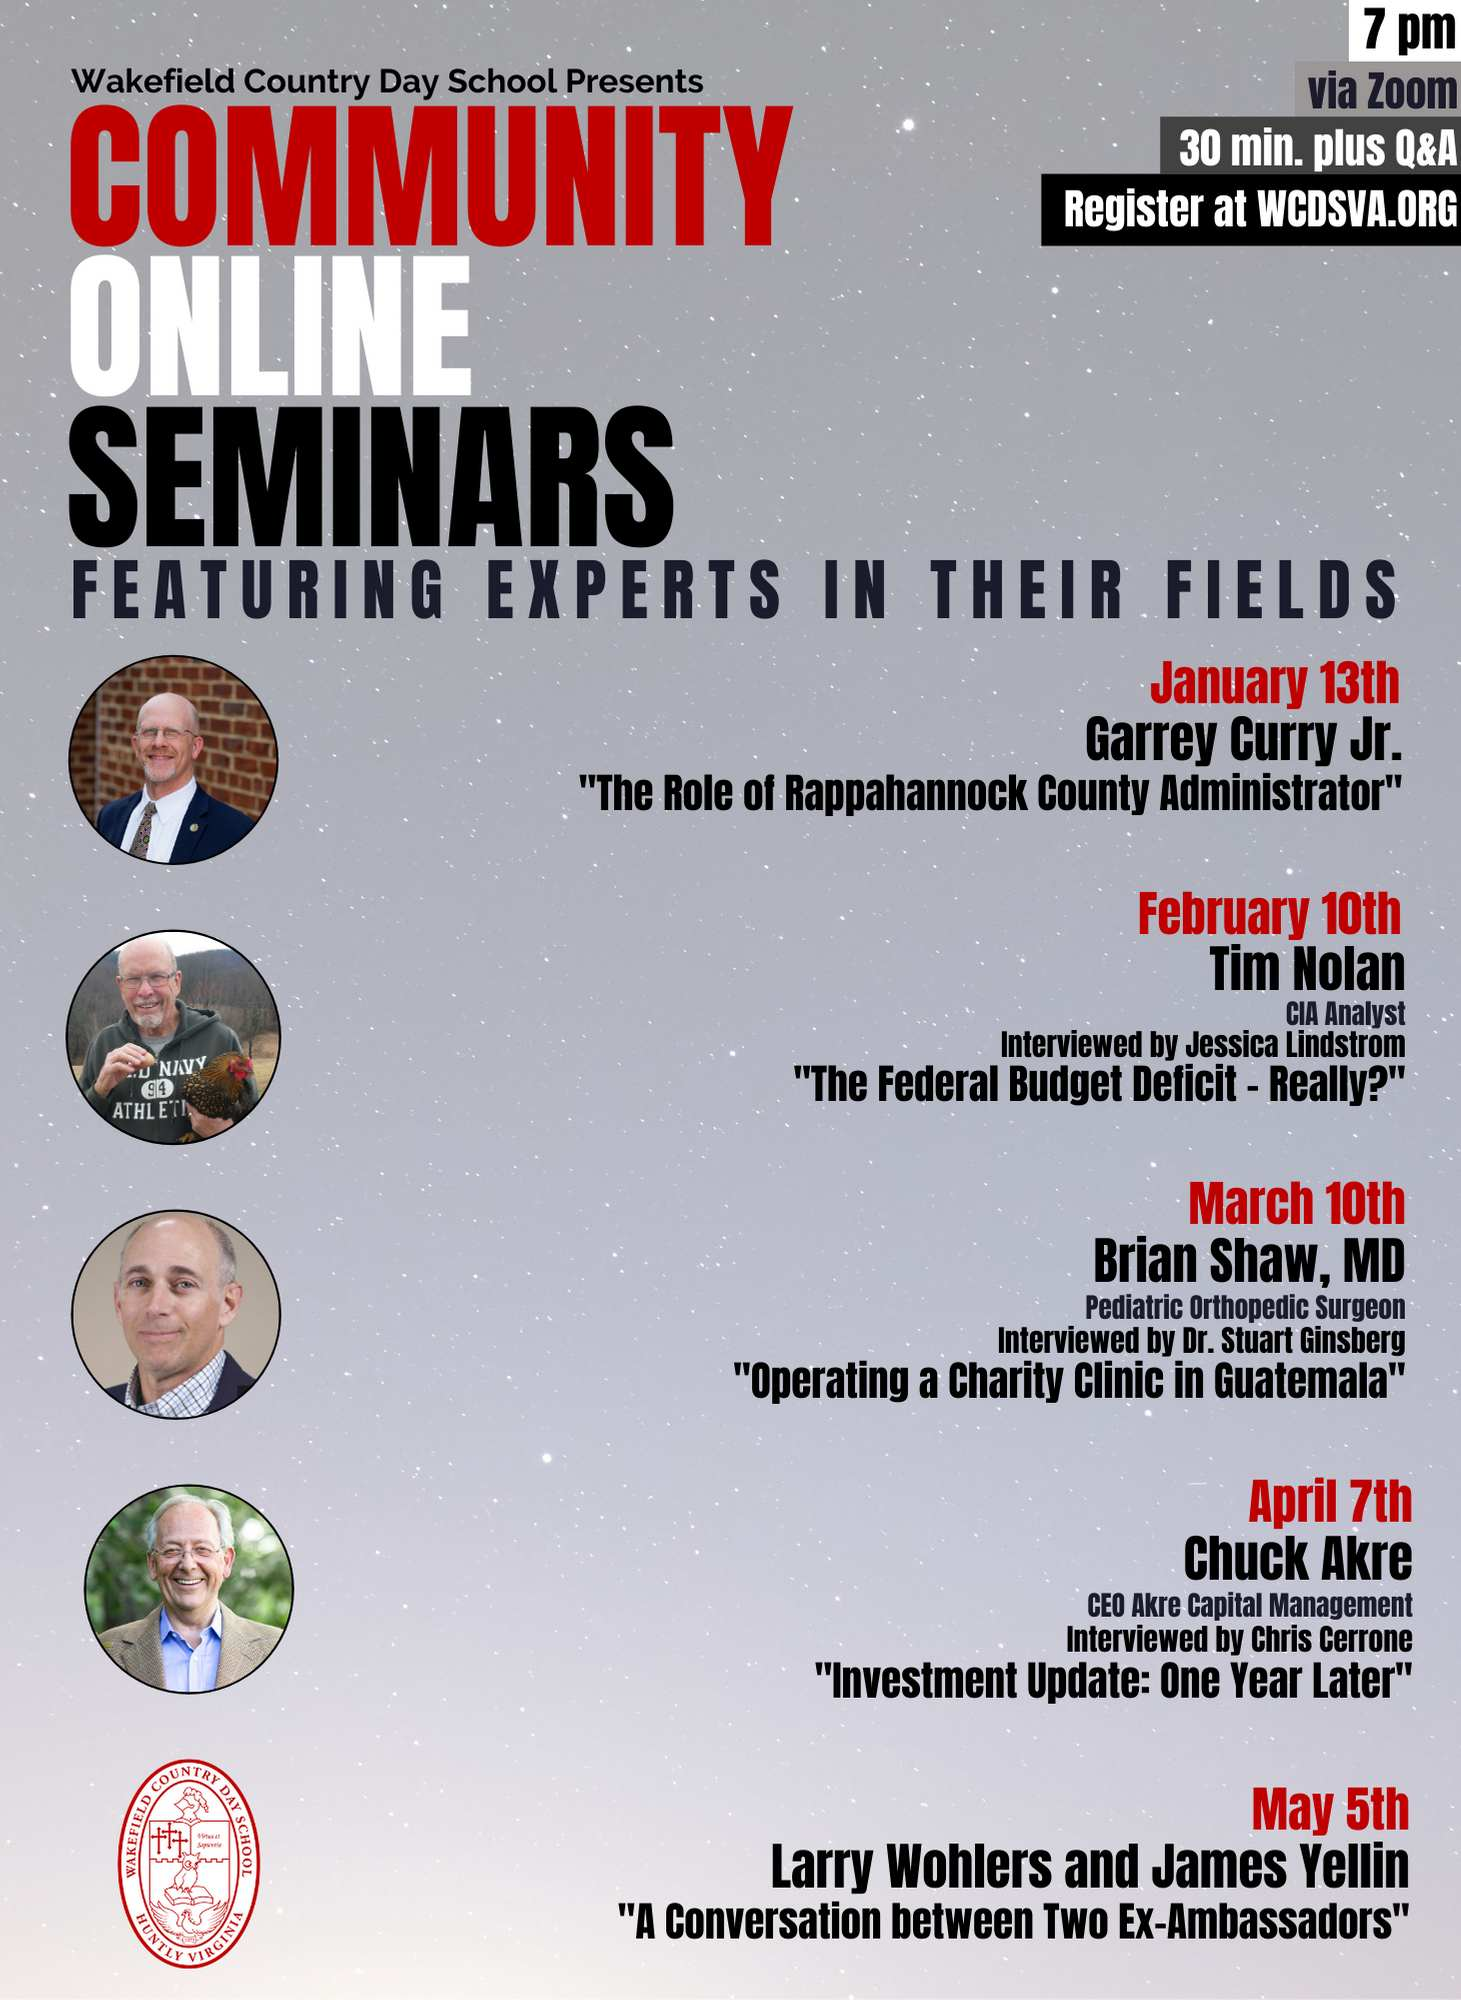 2021 Community Online Seminars